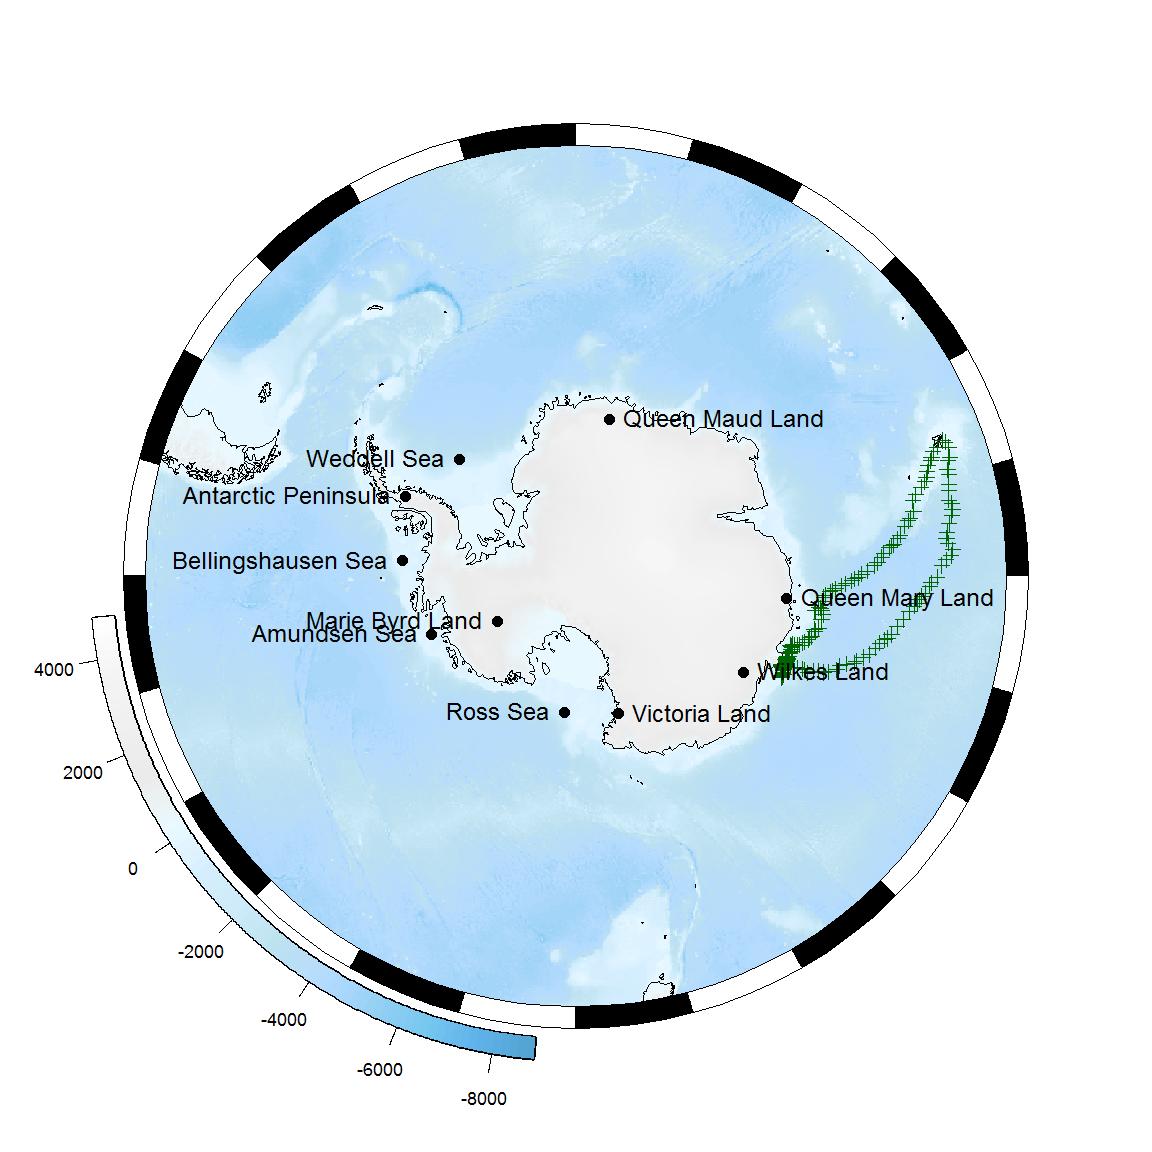 rOpenSci | The Antarctic/Southern Ocean rOpenSci community